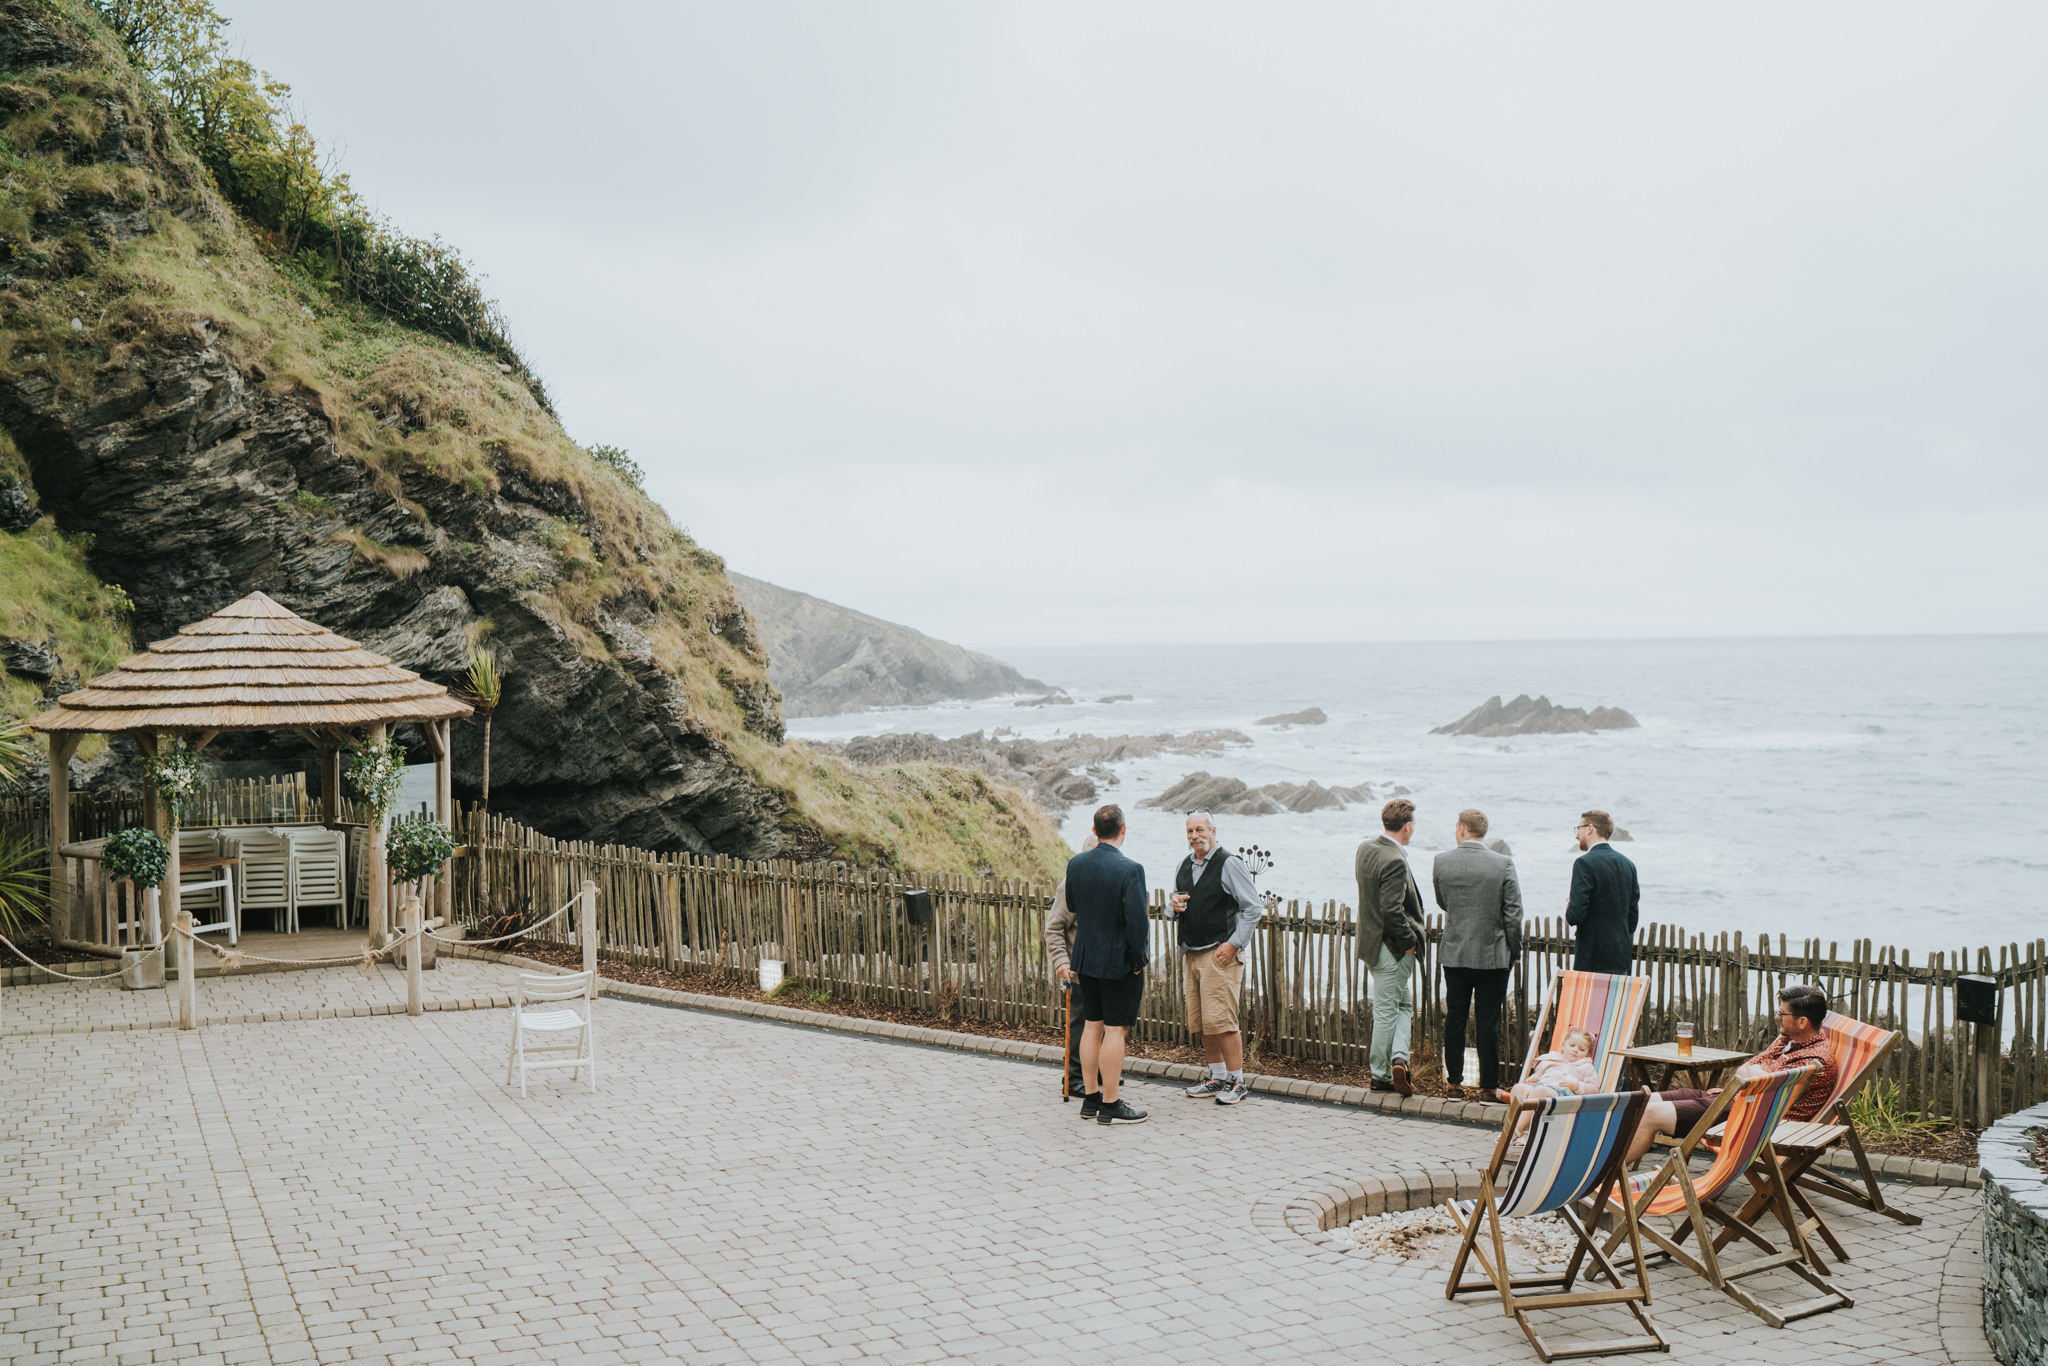 john-amy-relaxed-beach-wedding-tunnels-beaches-ilfracombe-north-devon-grace-elizabeth-colchester-essex-alternative-relaxed-wedding-photography-devon-suffolk-norfolk-essex (84 of 159).jpg